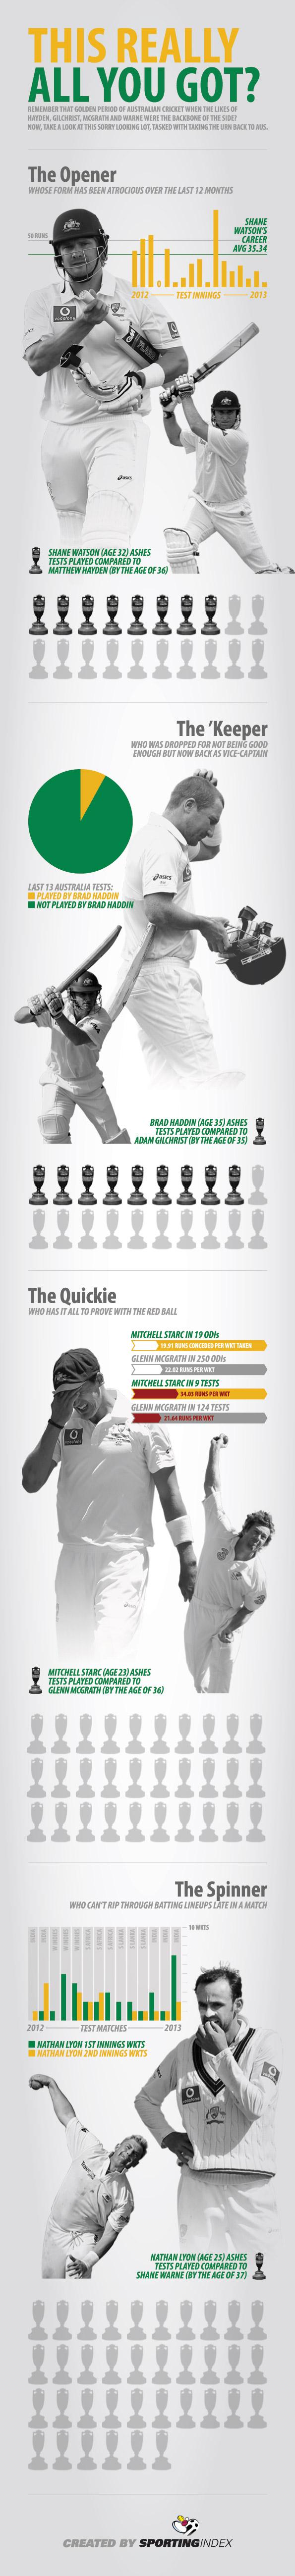 Downgrading graph of Cricket team of Australia